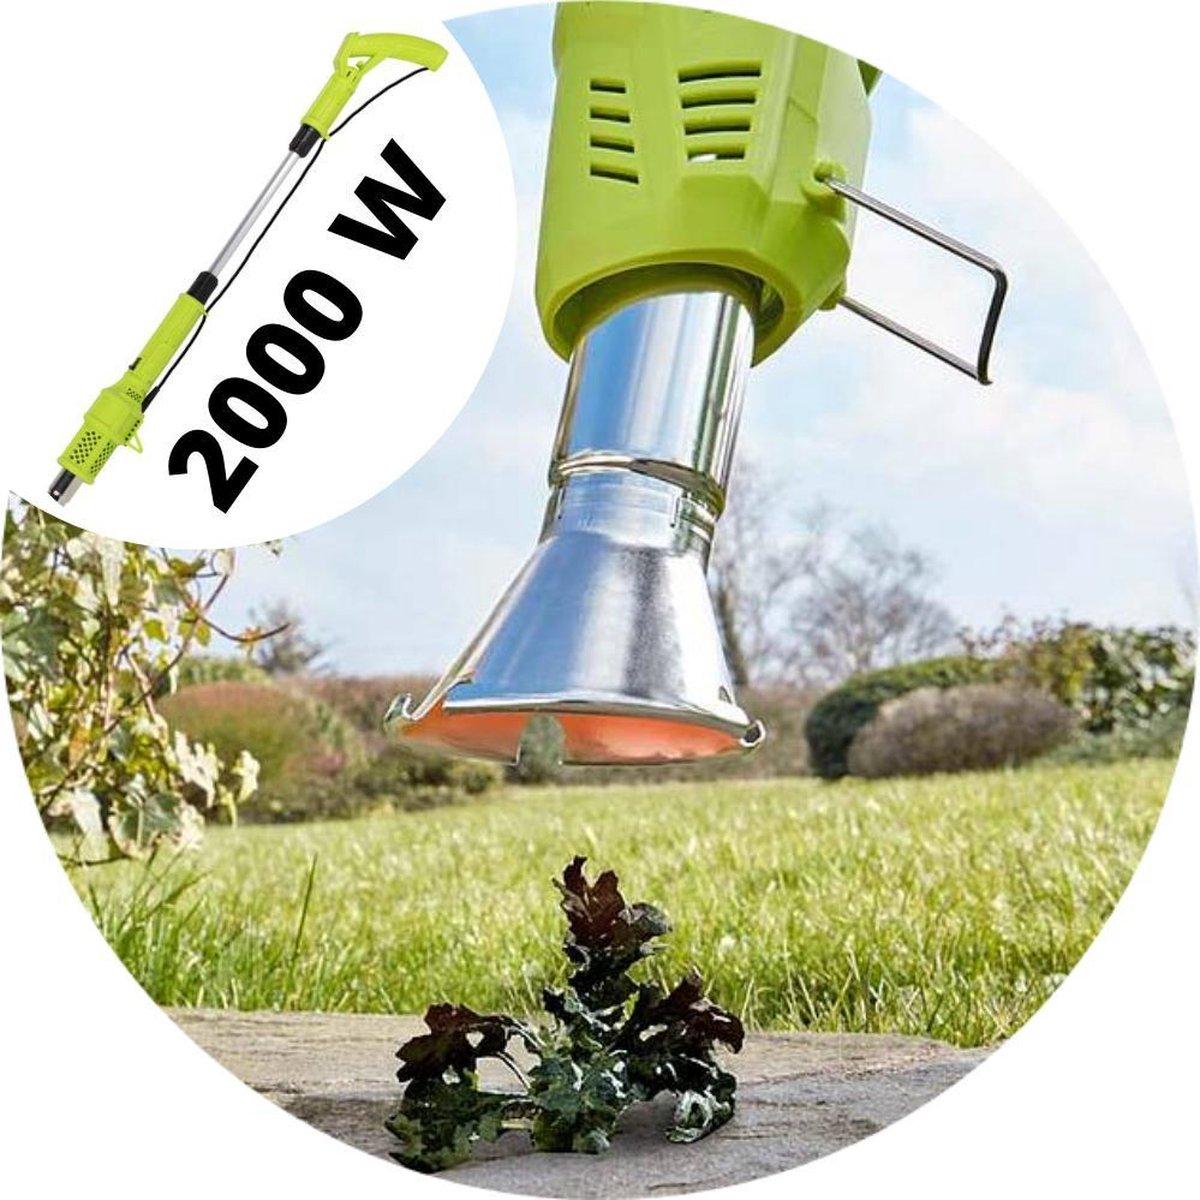 DirectSupply Onkruidbrander - Brander 2000W - Elektrisch - Onkruidbestrijding - Onkruidbrander Elekt